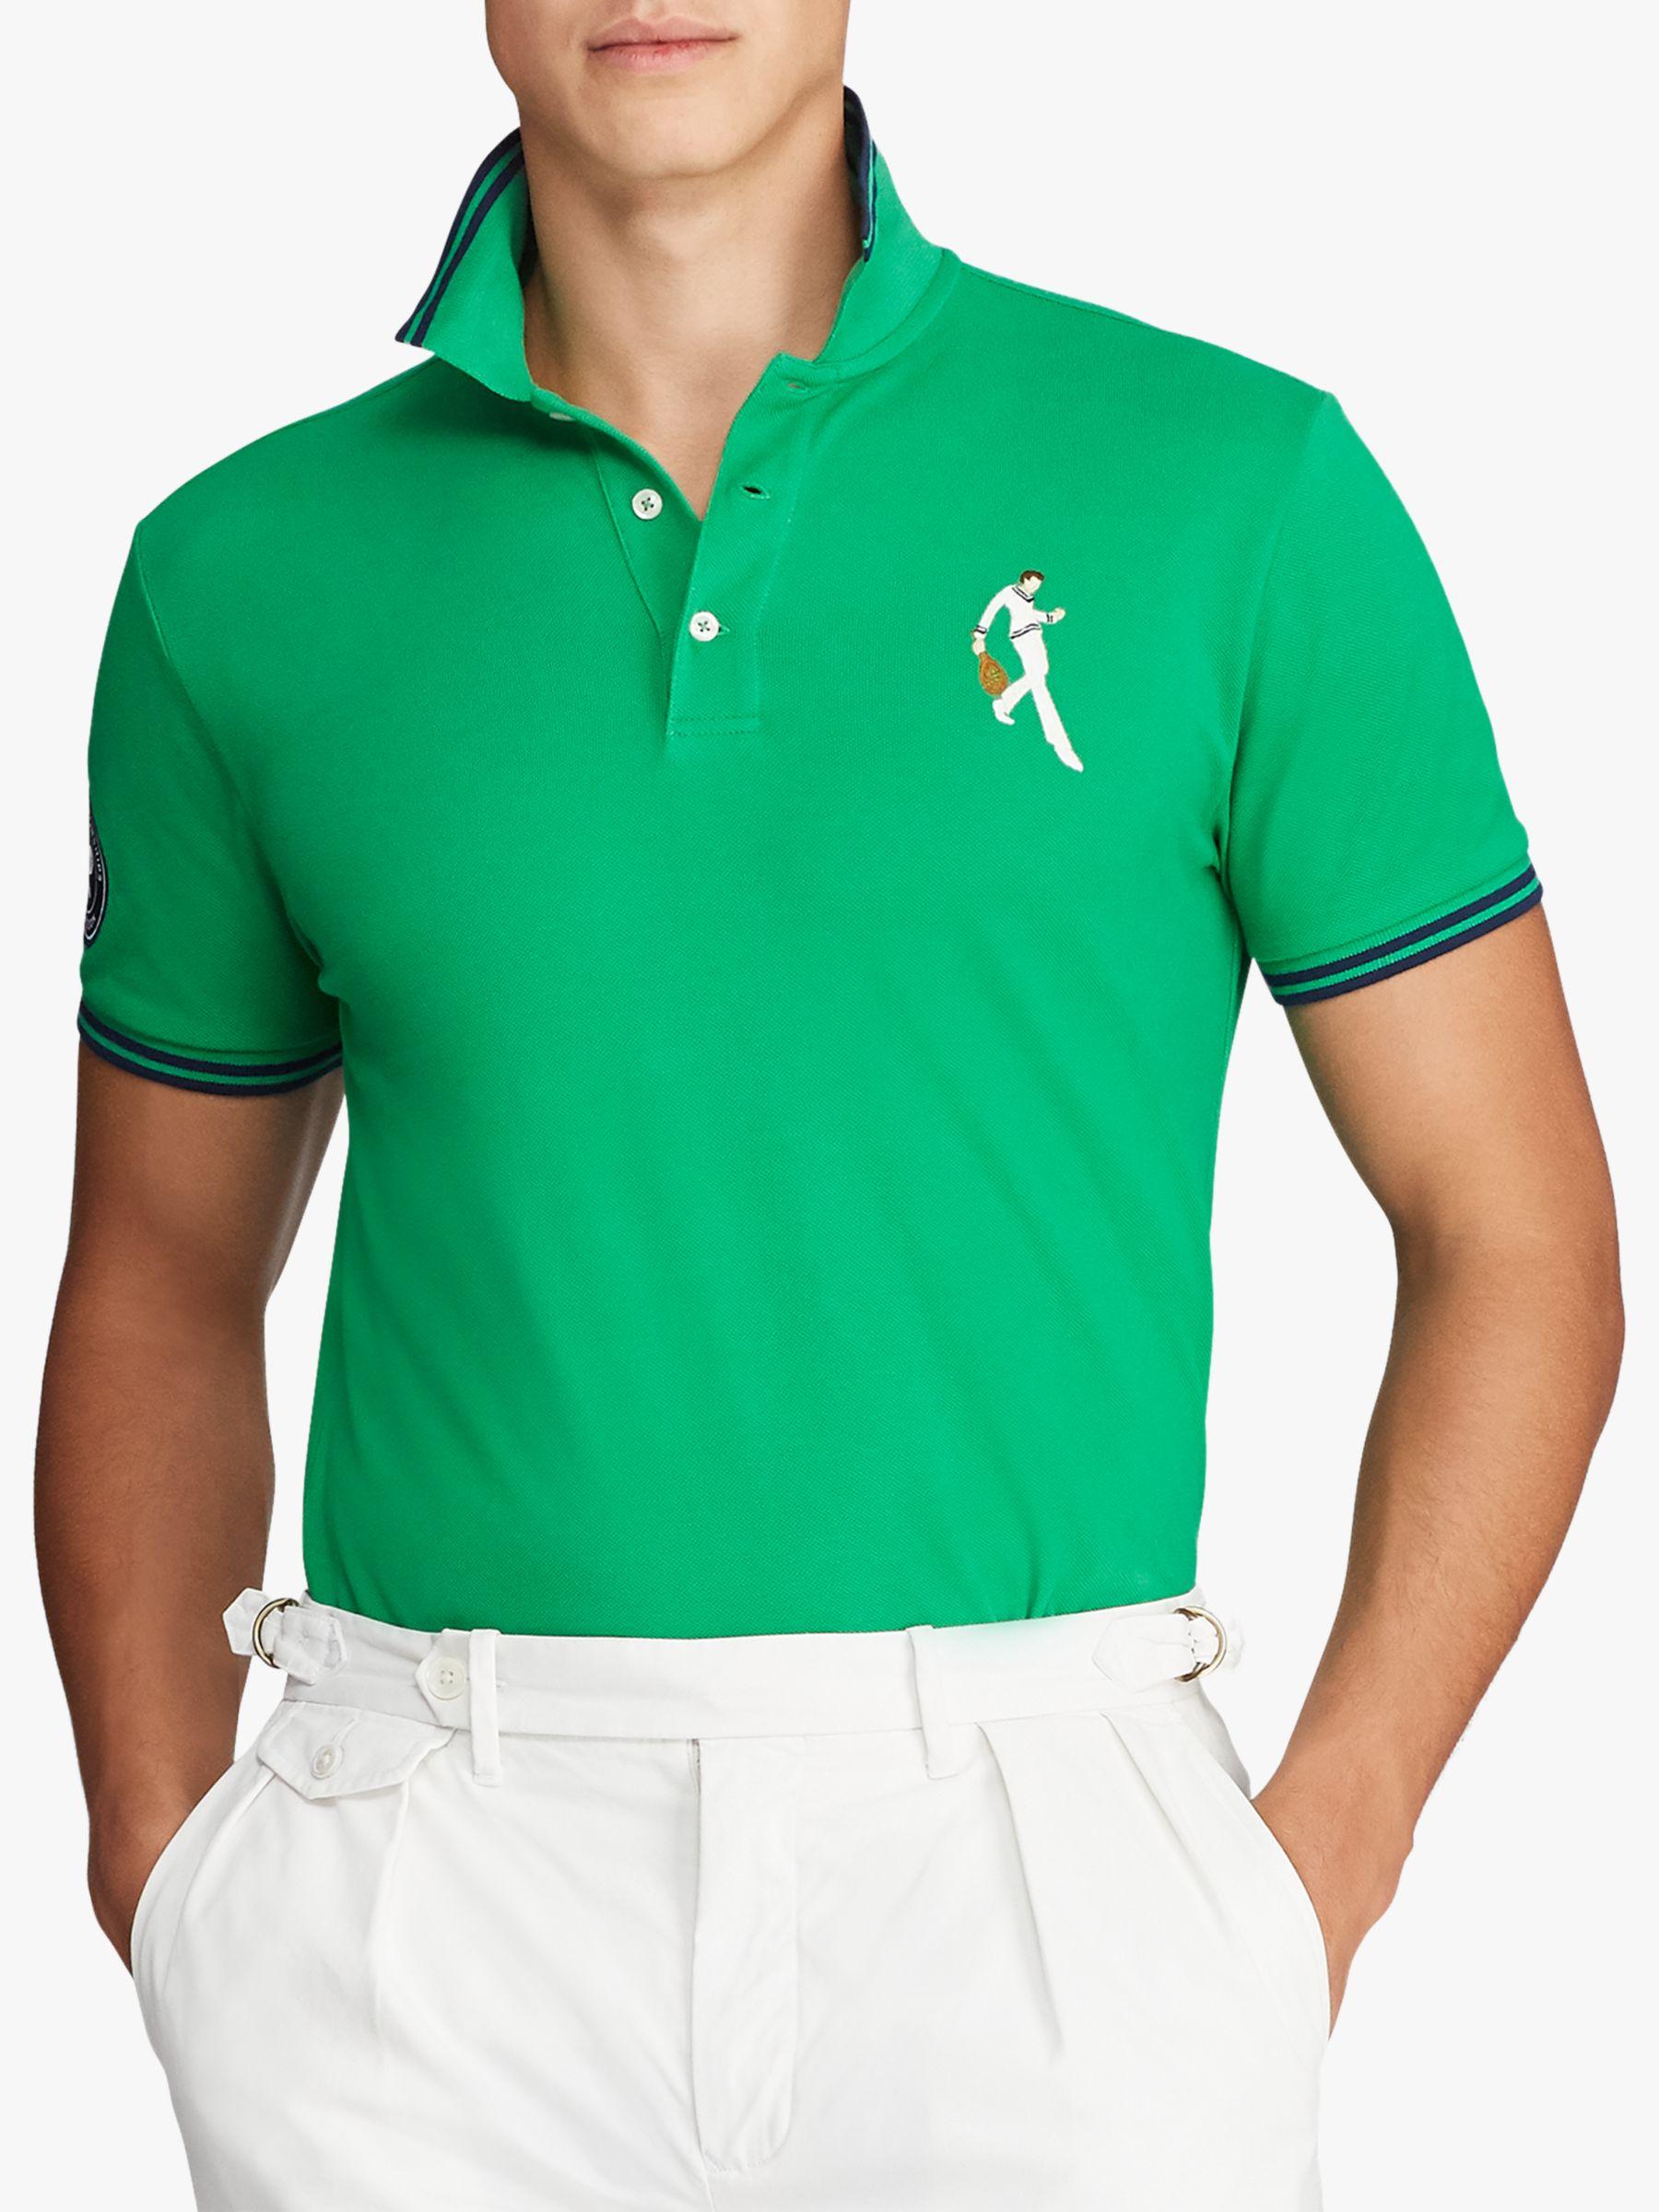 921ef5fff1 Polo Ralph Lauren Wimbledon Custom Slim Fit Polo Top, Stem